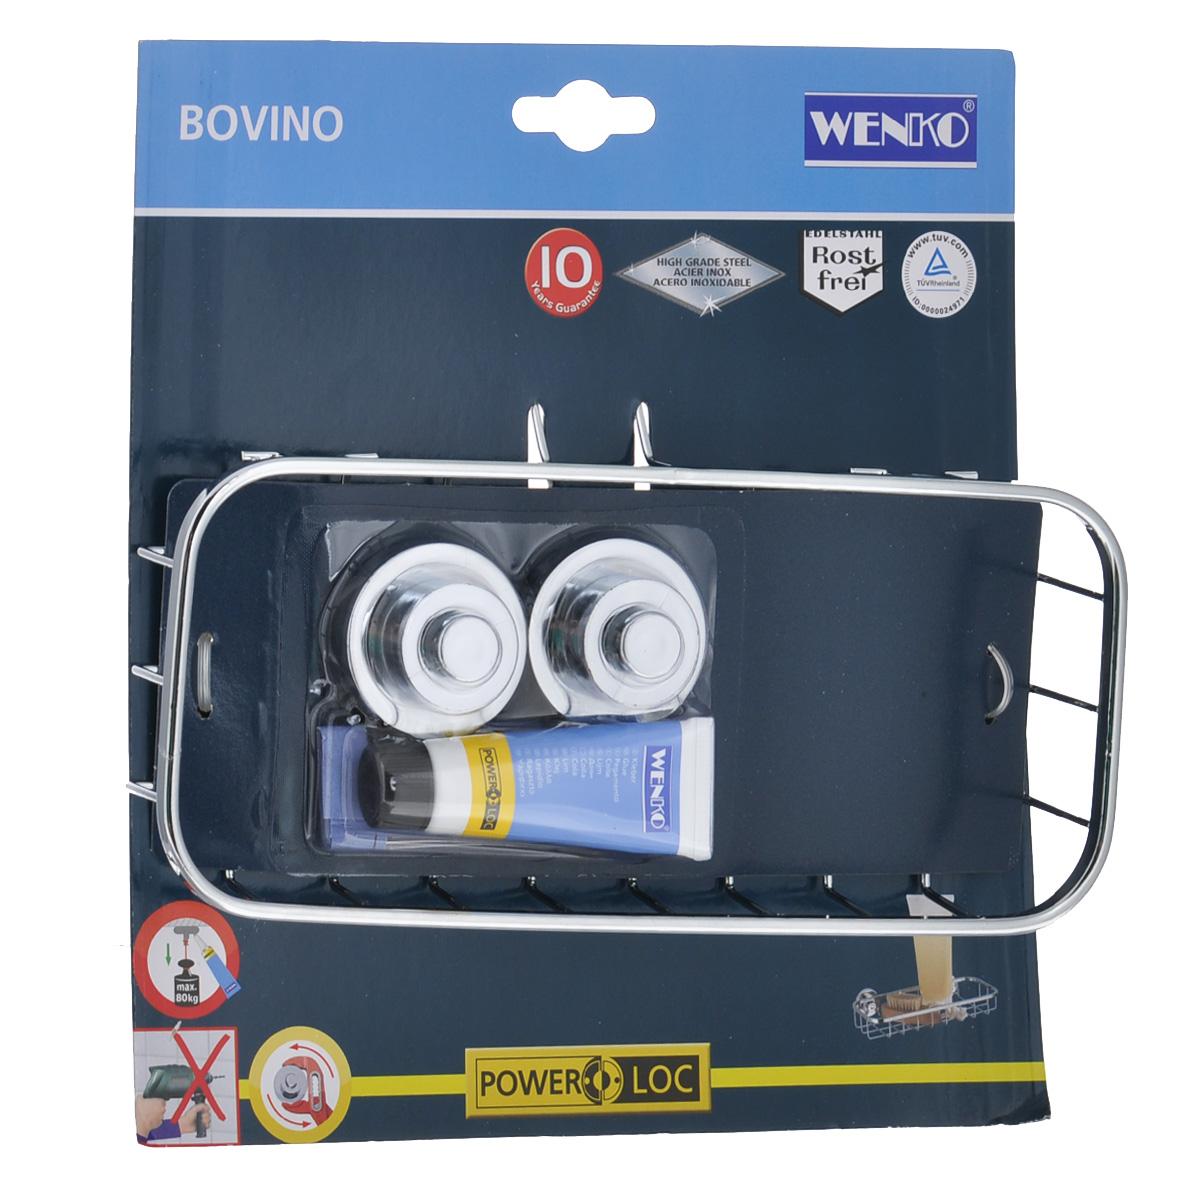 Полка Wenko Bovino для ванной комнаты. 1779510017795100